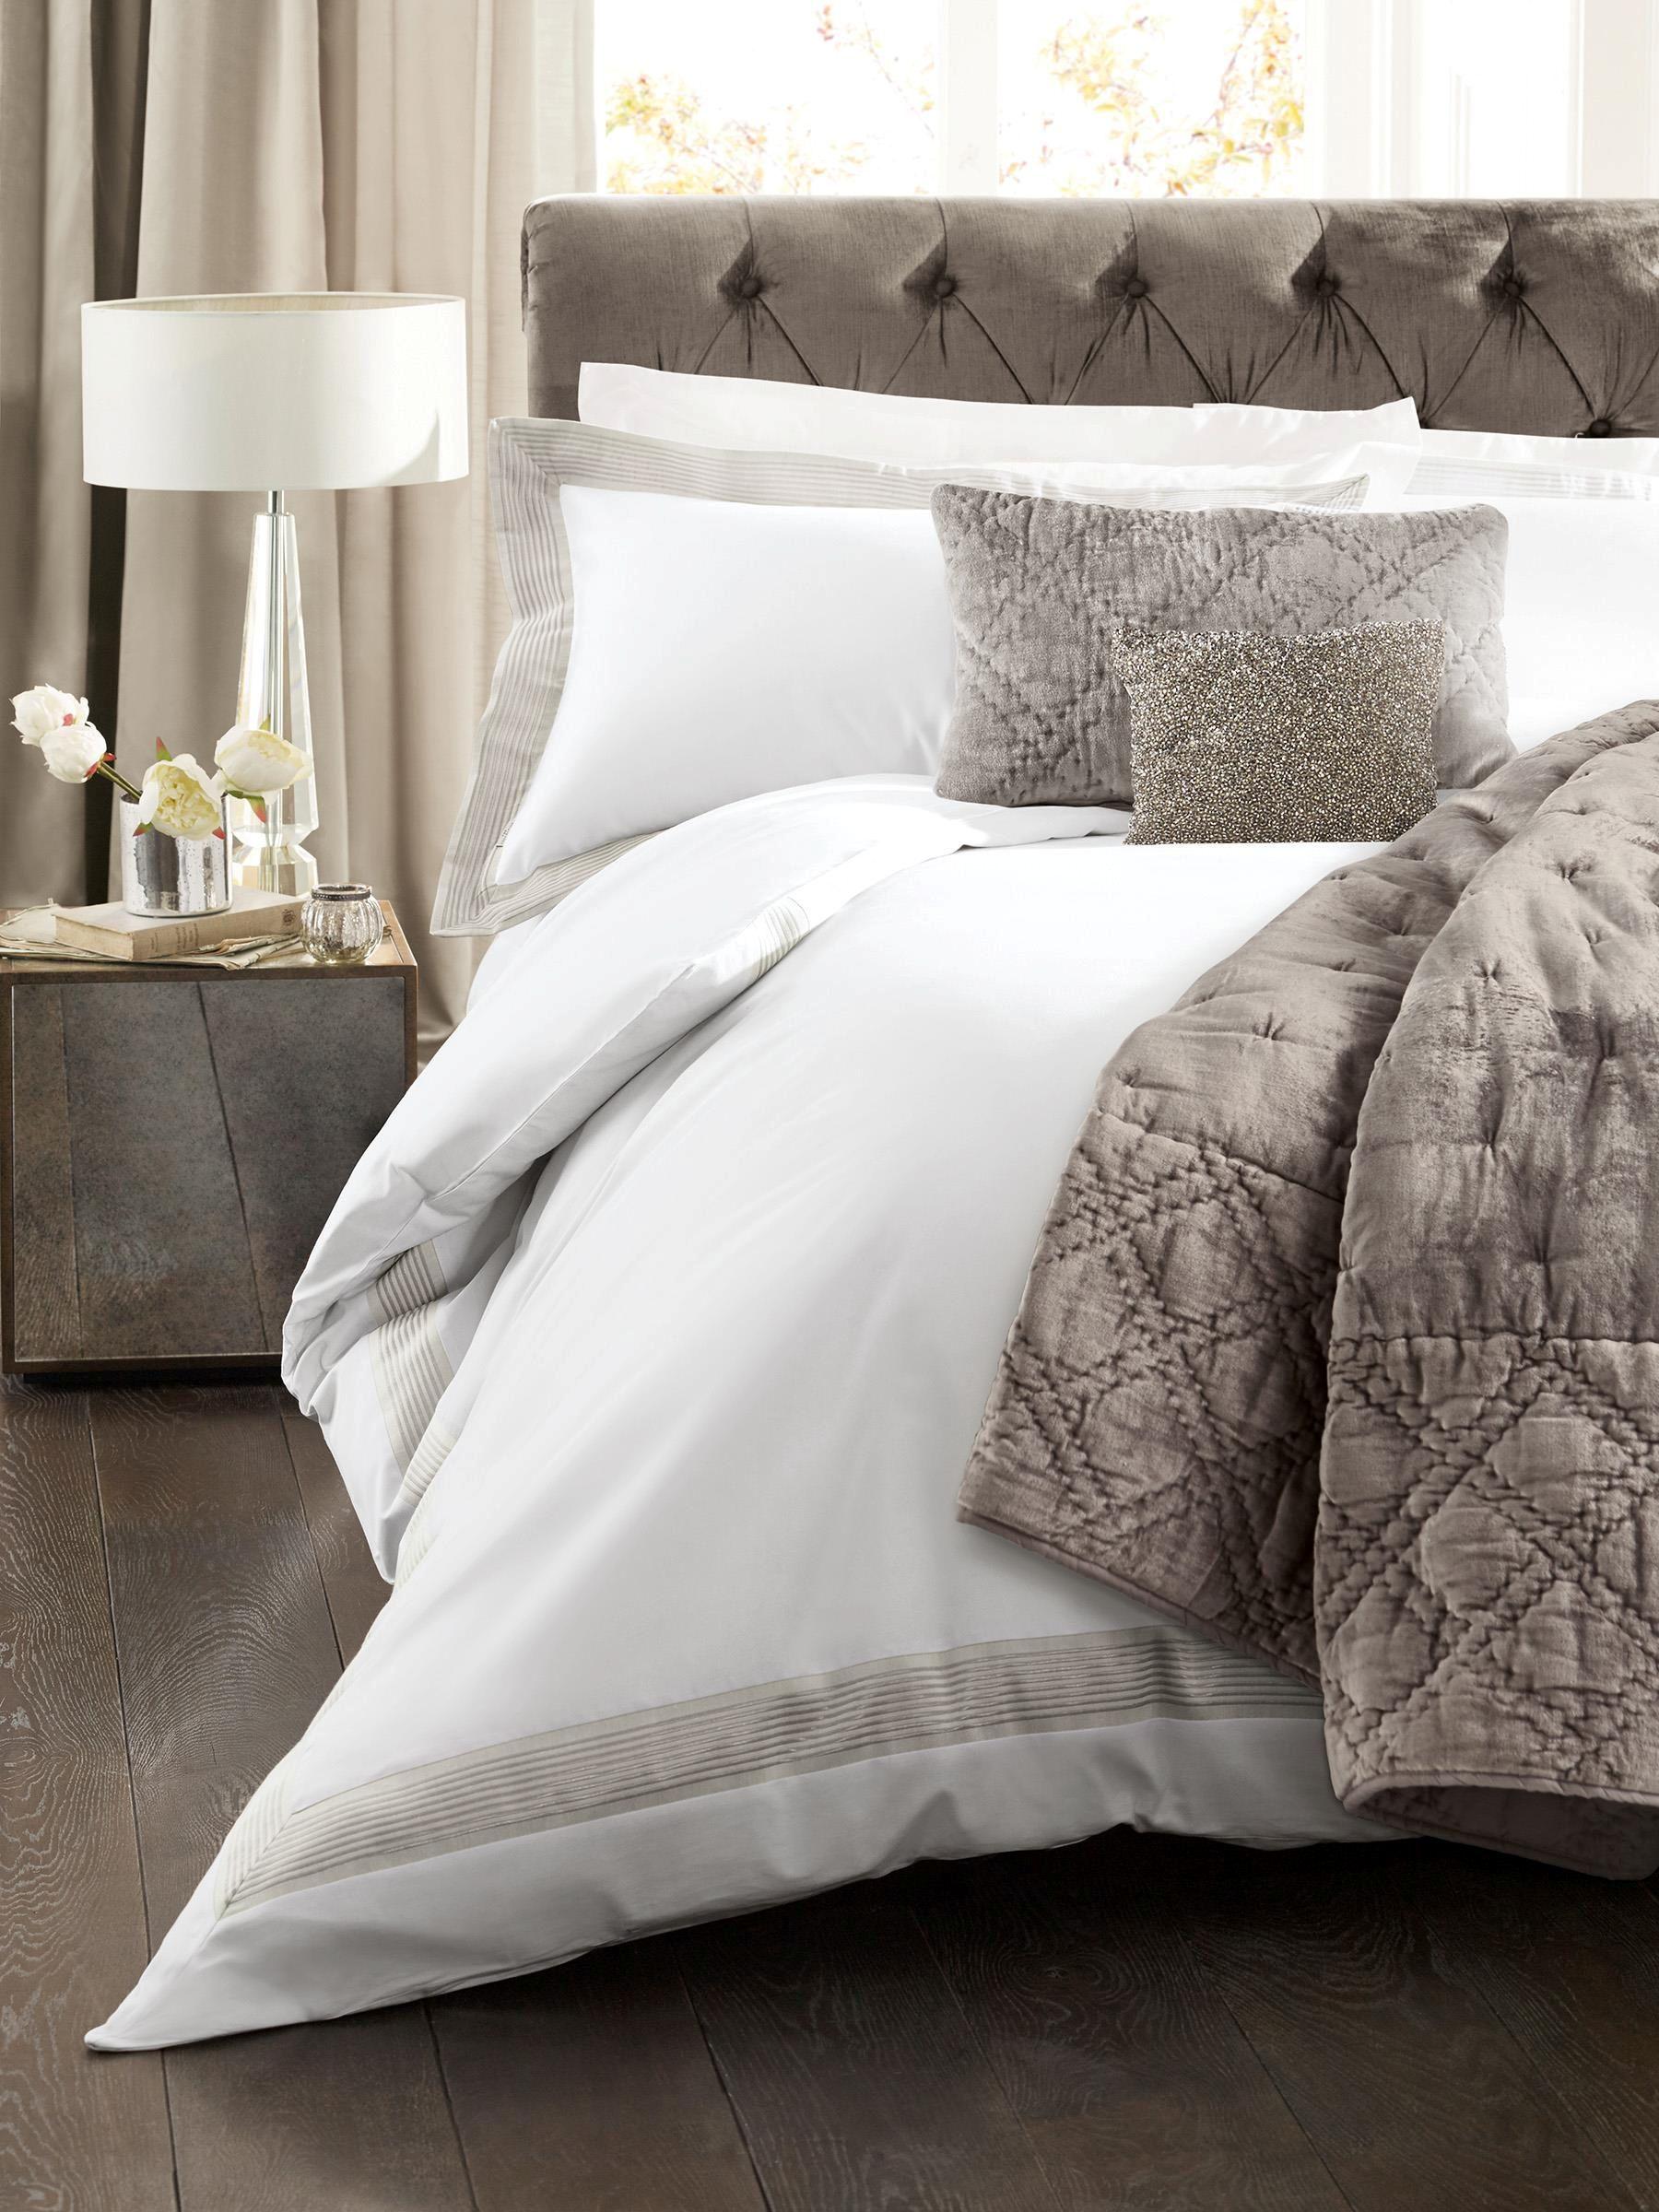 Buy Set 2 Jacquard Border Oxford Pillowcases from the Next UK